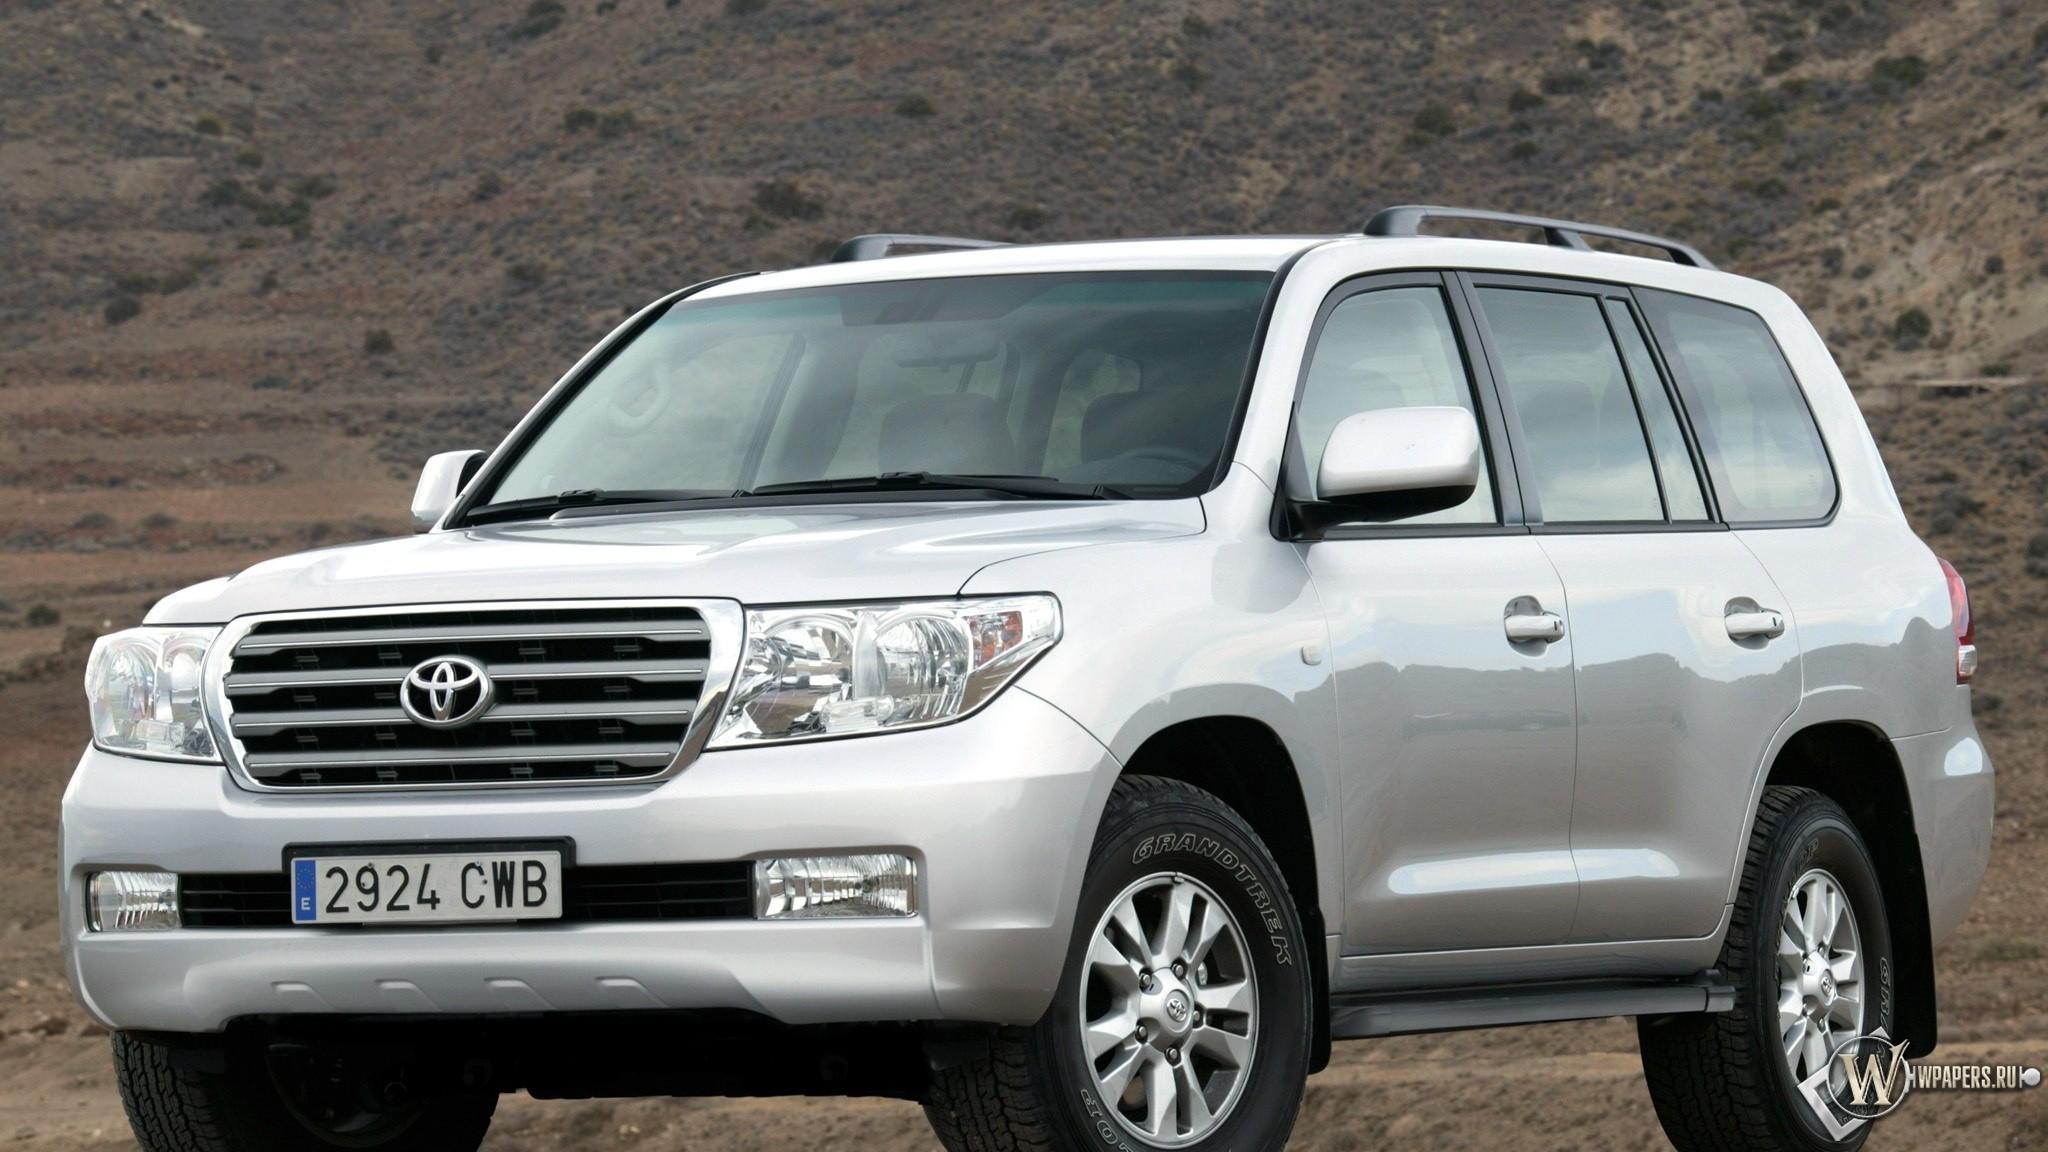 Toyota Land Cruiser 2048x1152